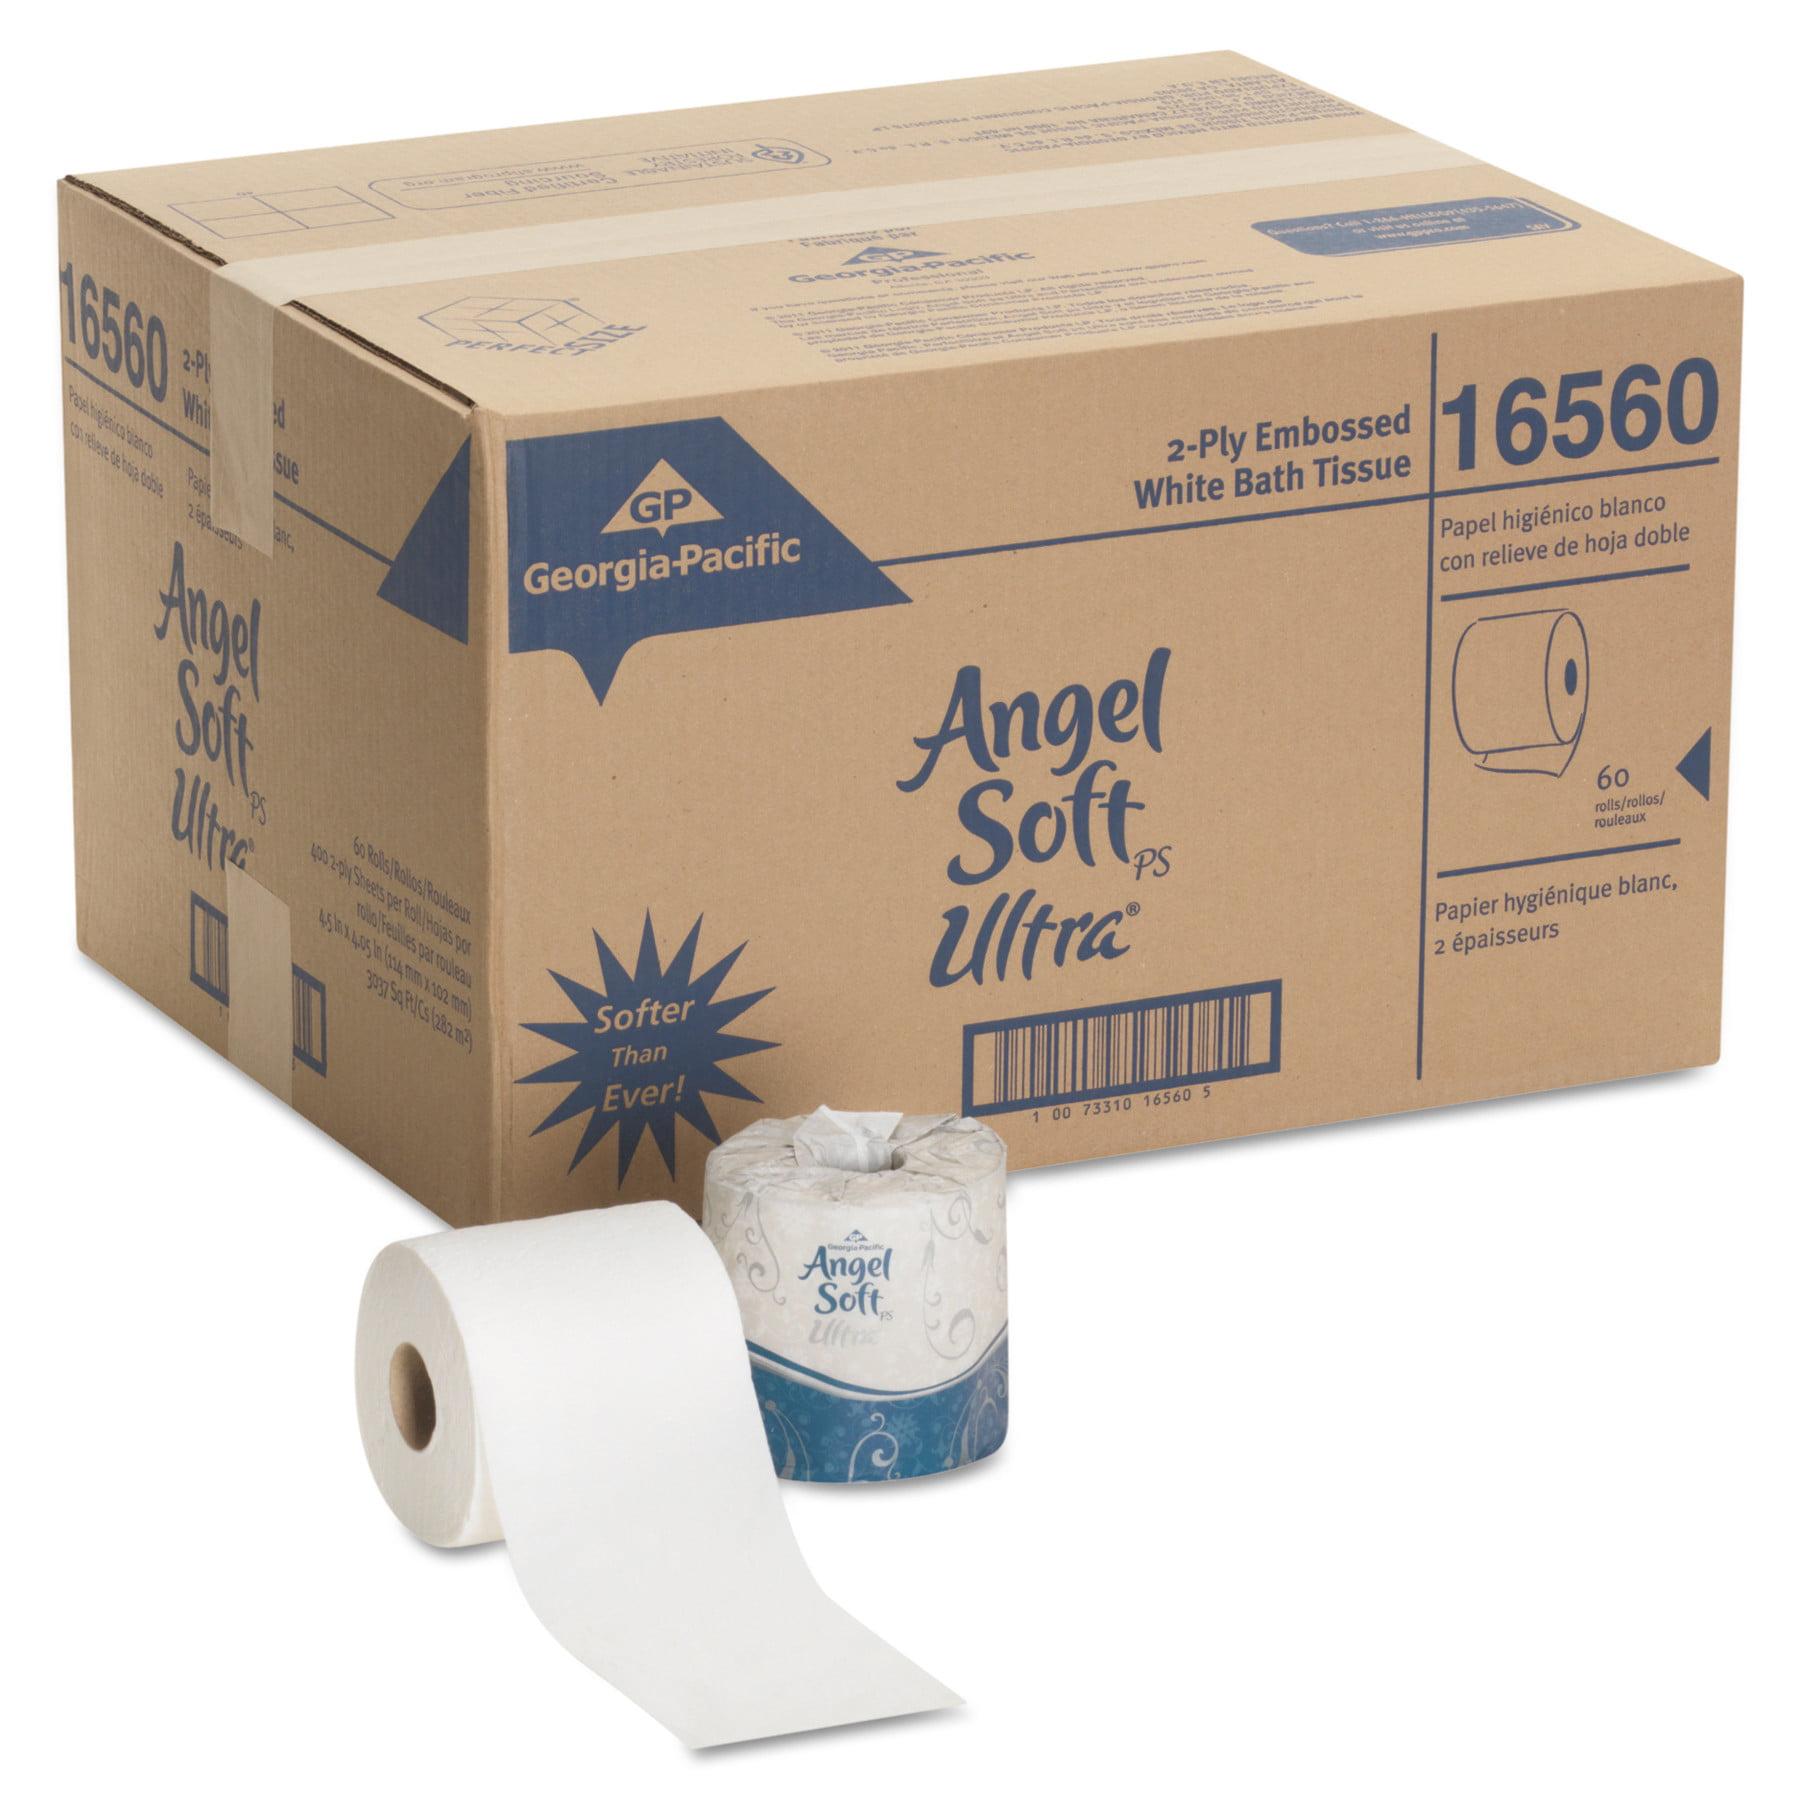 Georgia Pacific Angel Soft Ultra Two Ply White Premium Bathroom Tissue  60  ct   Walmart com. Georgia Pacific Angel Soft Ultra Two Ply White Premium Bathroom